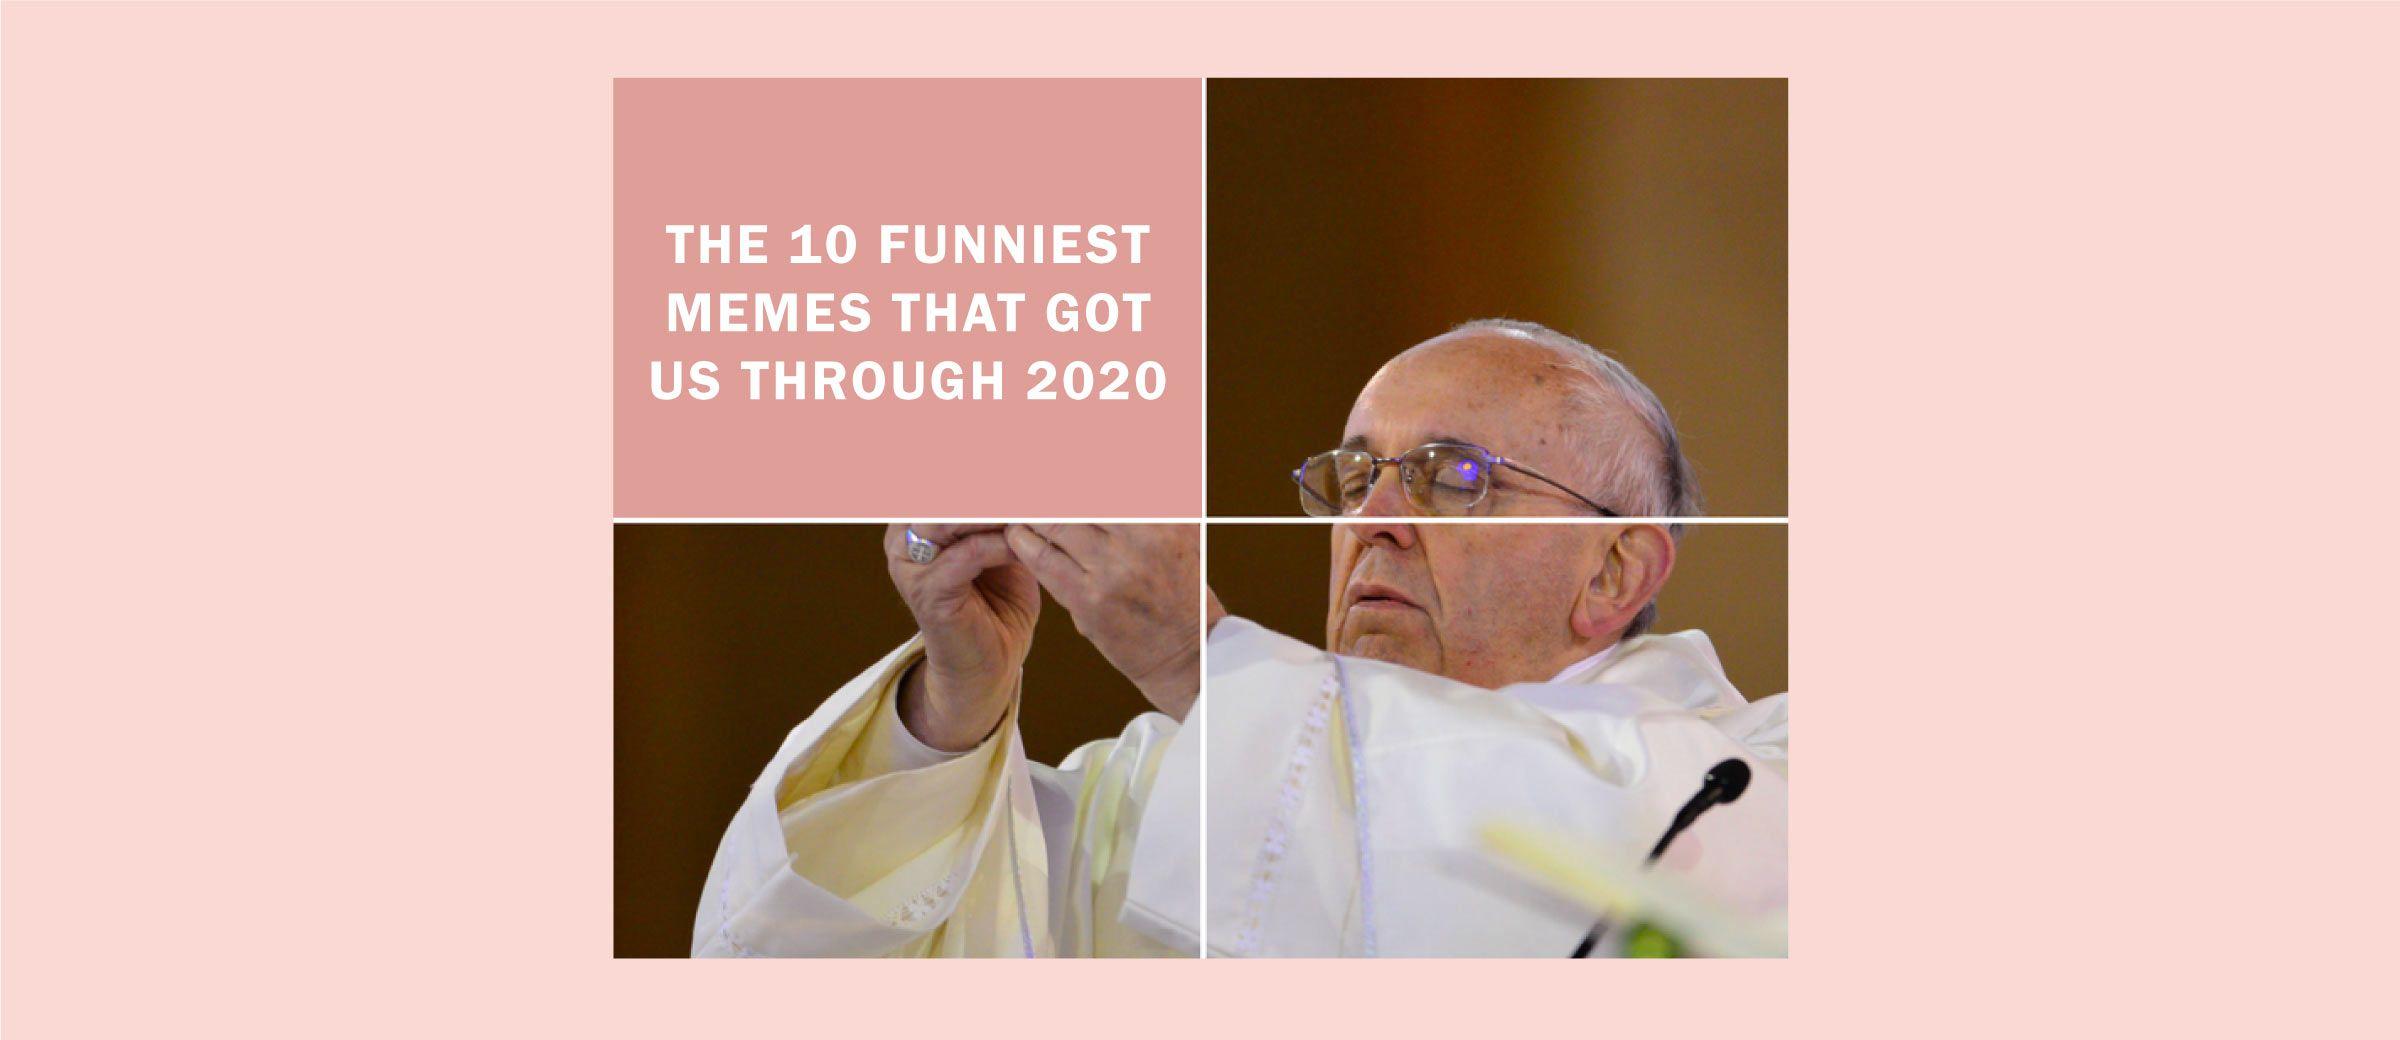 The 10 Funniest Memes That Got Us Through 2020